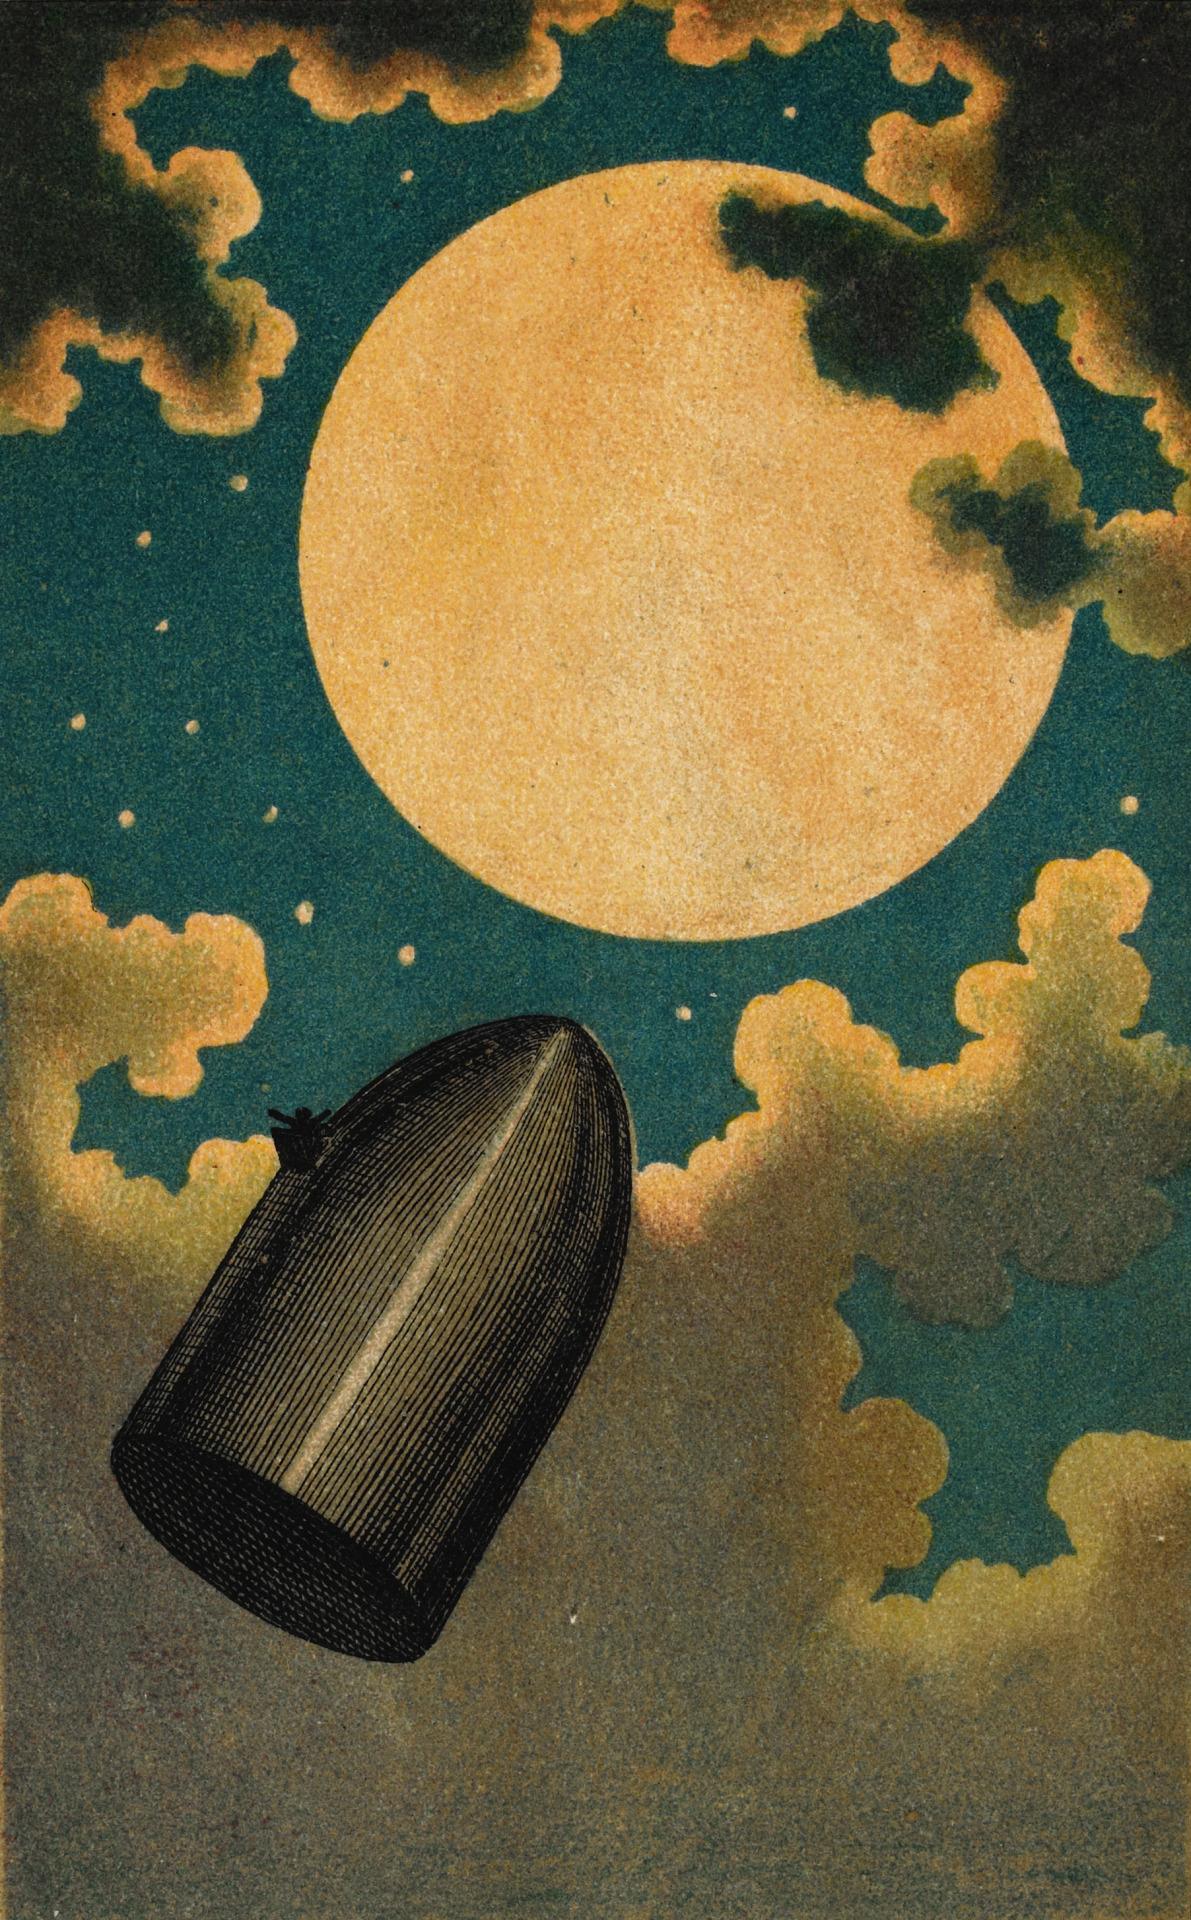 Émile-Antoine Bayard's Vivid Illustrations of Jules Verne ...